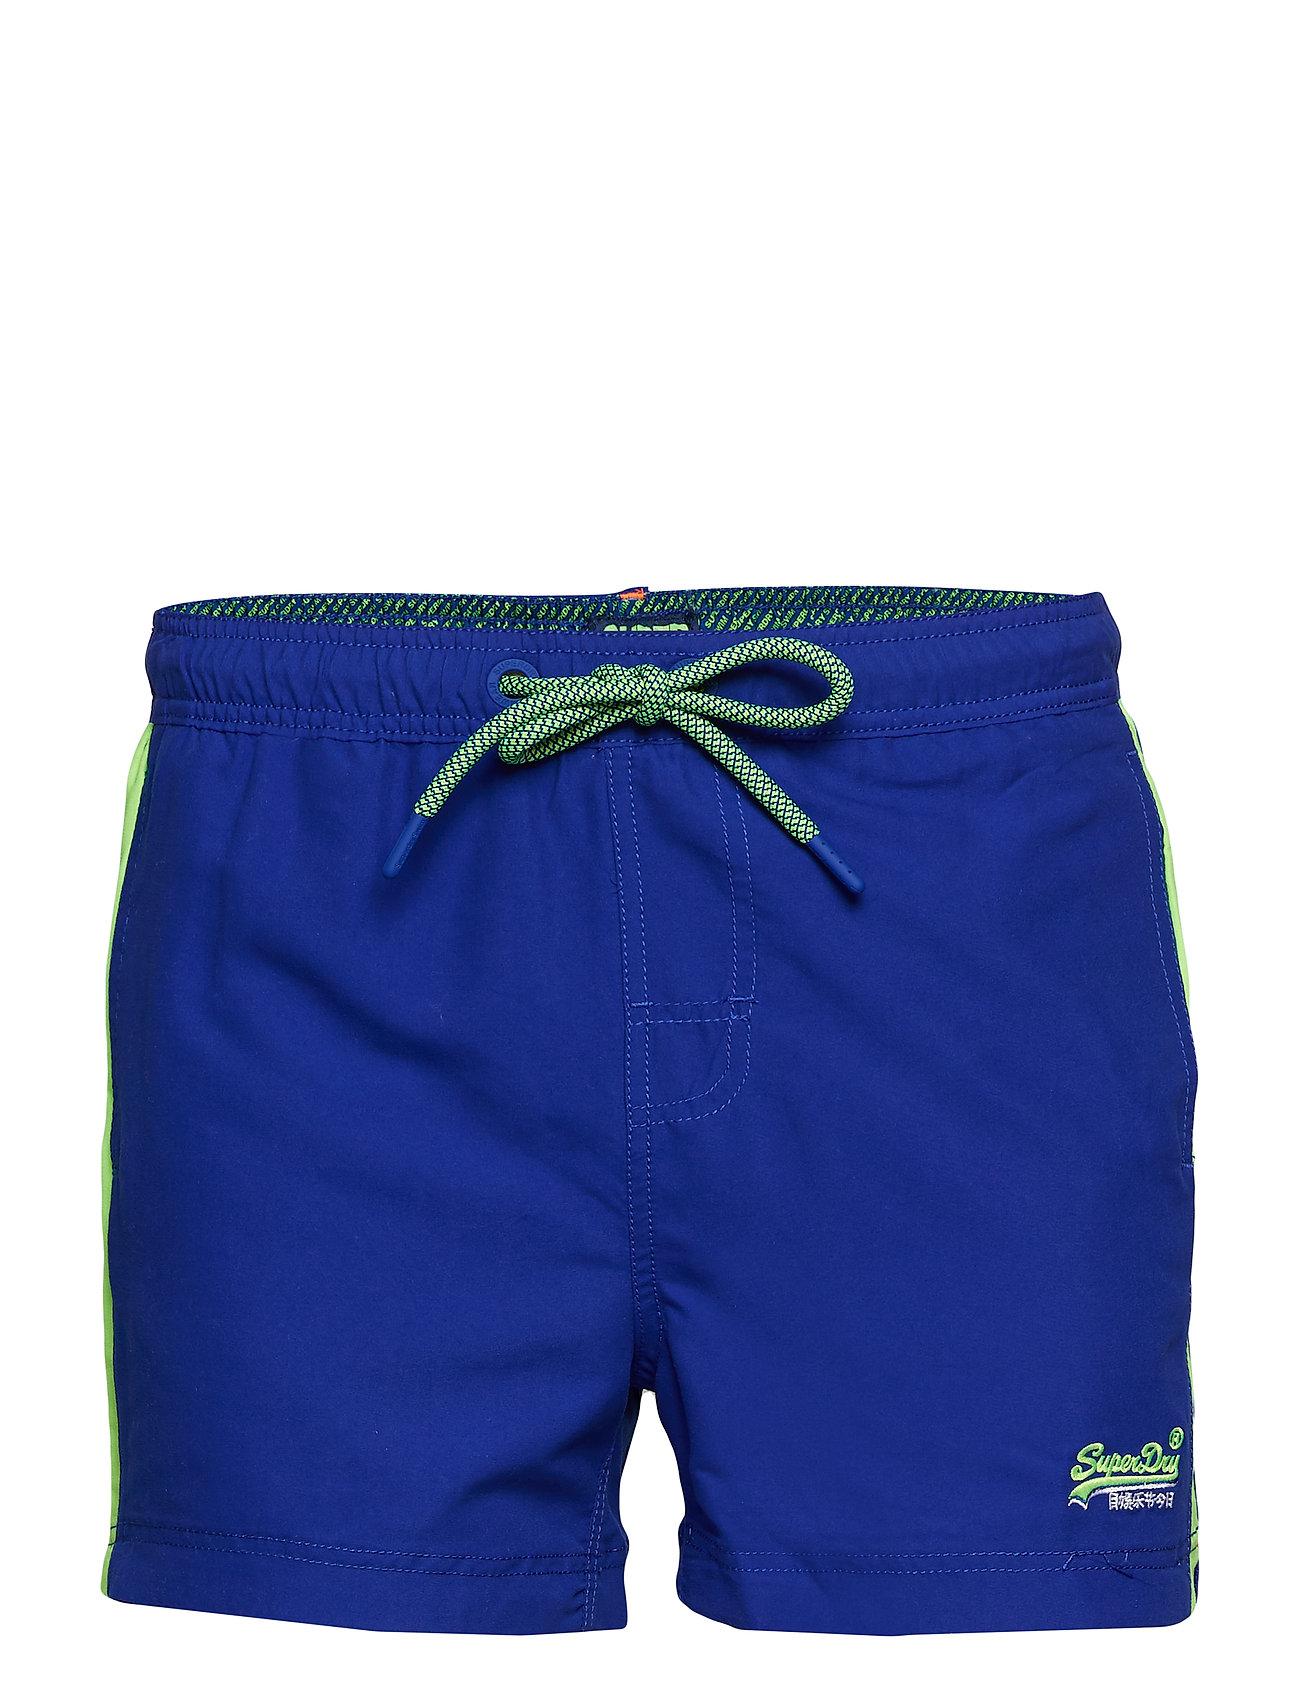 Beach Shortracer CobaltSuperdry Swim Volley nwX8kO0P